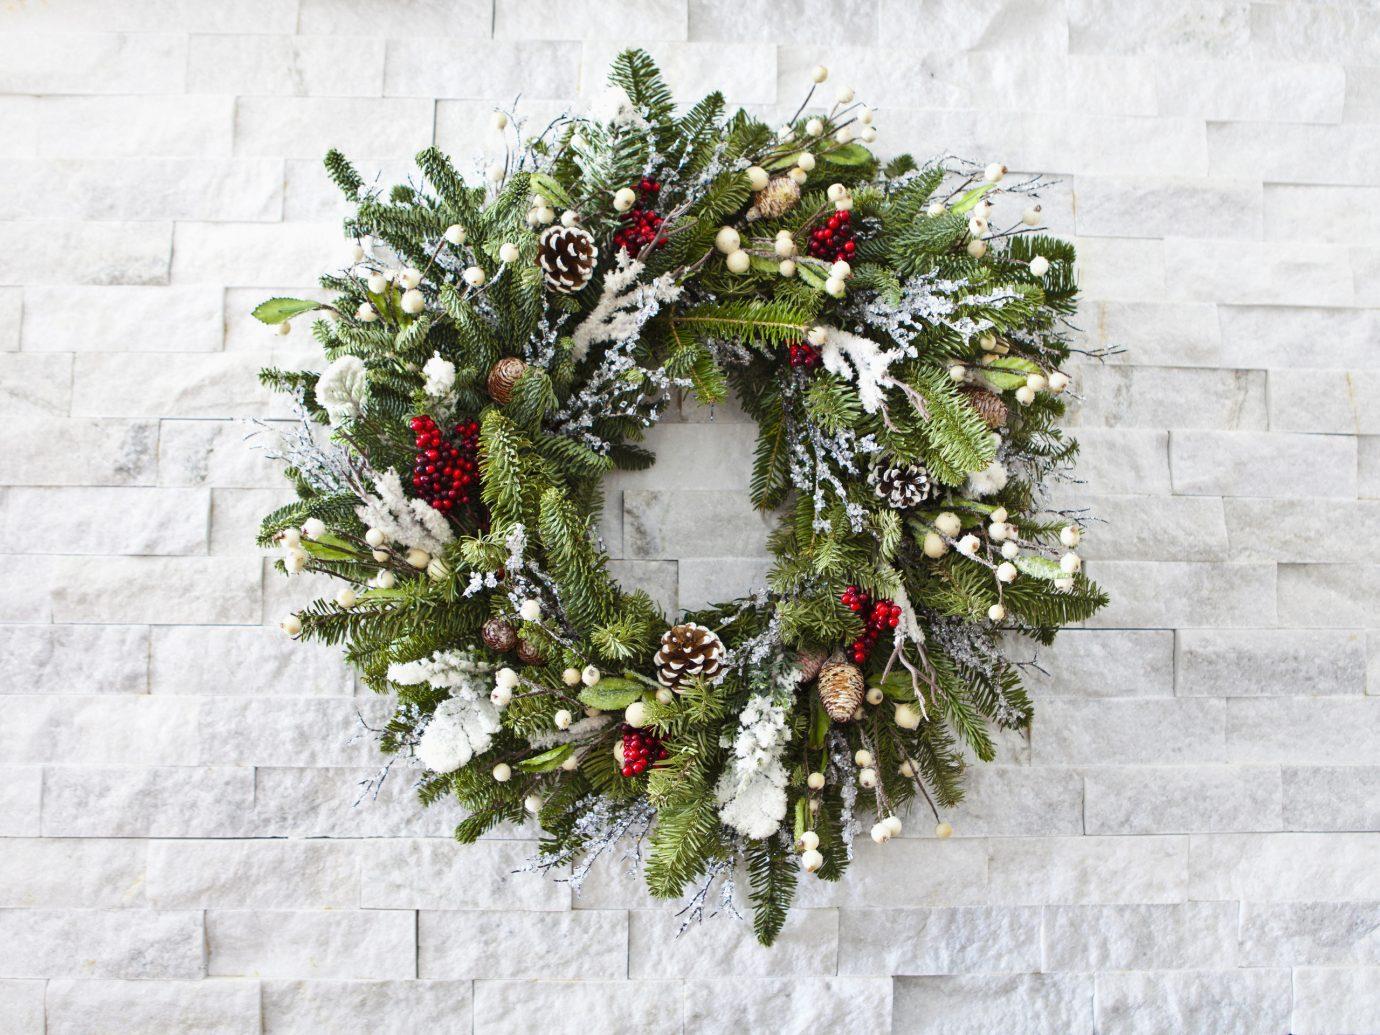 Style + Design building flower wreath christmas decoration branch plant flower arranging floristry twig decor Christmas tree floral design stone set